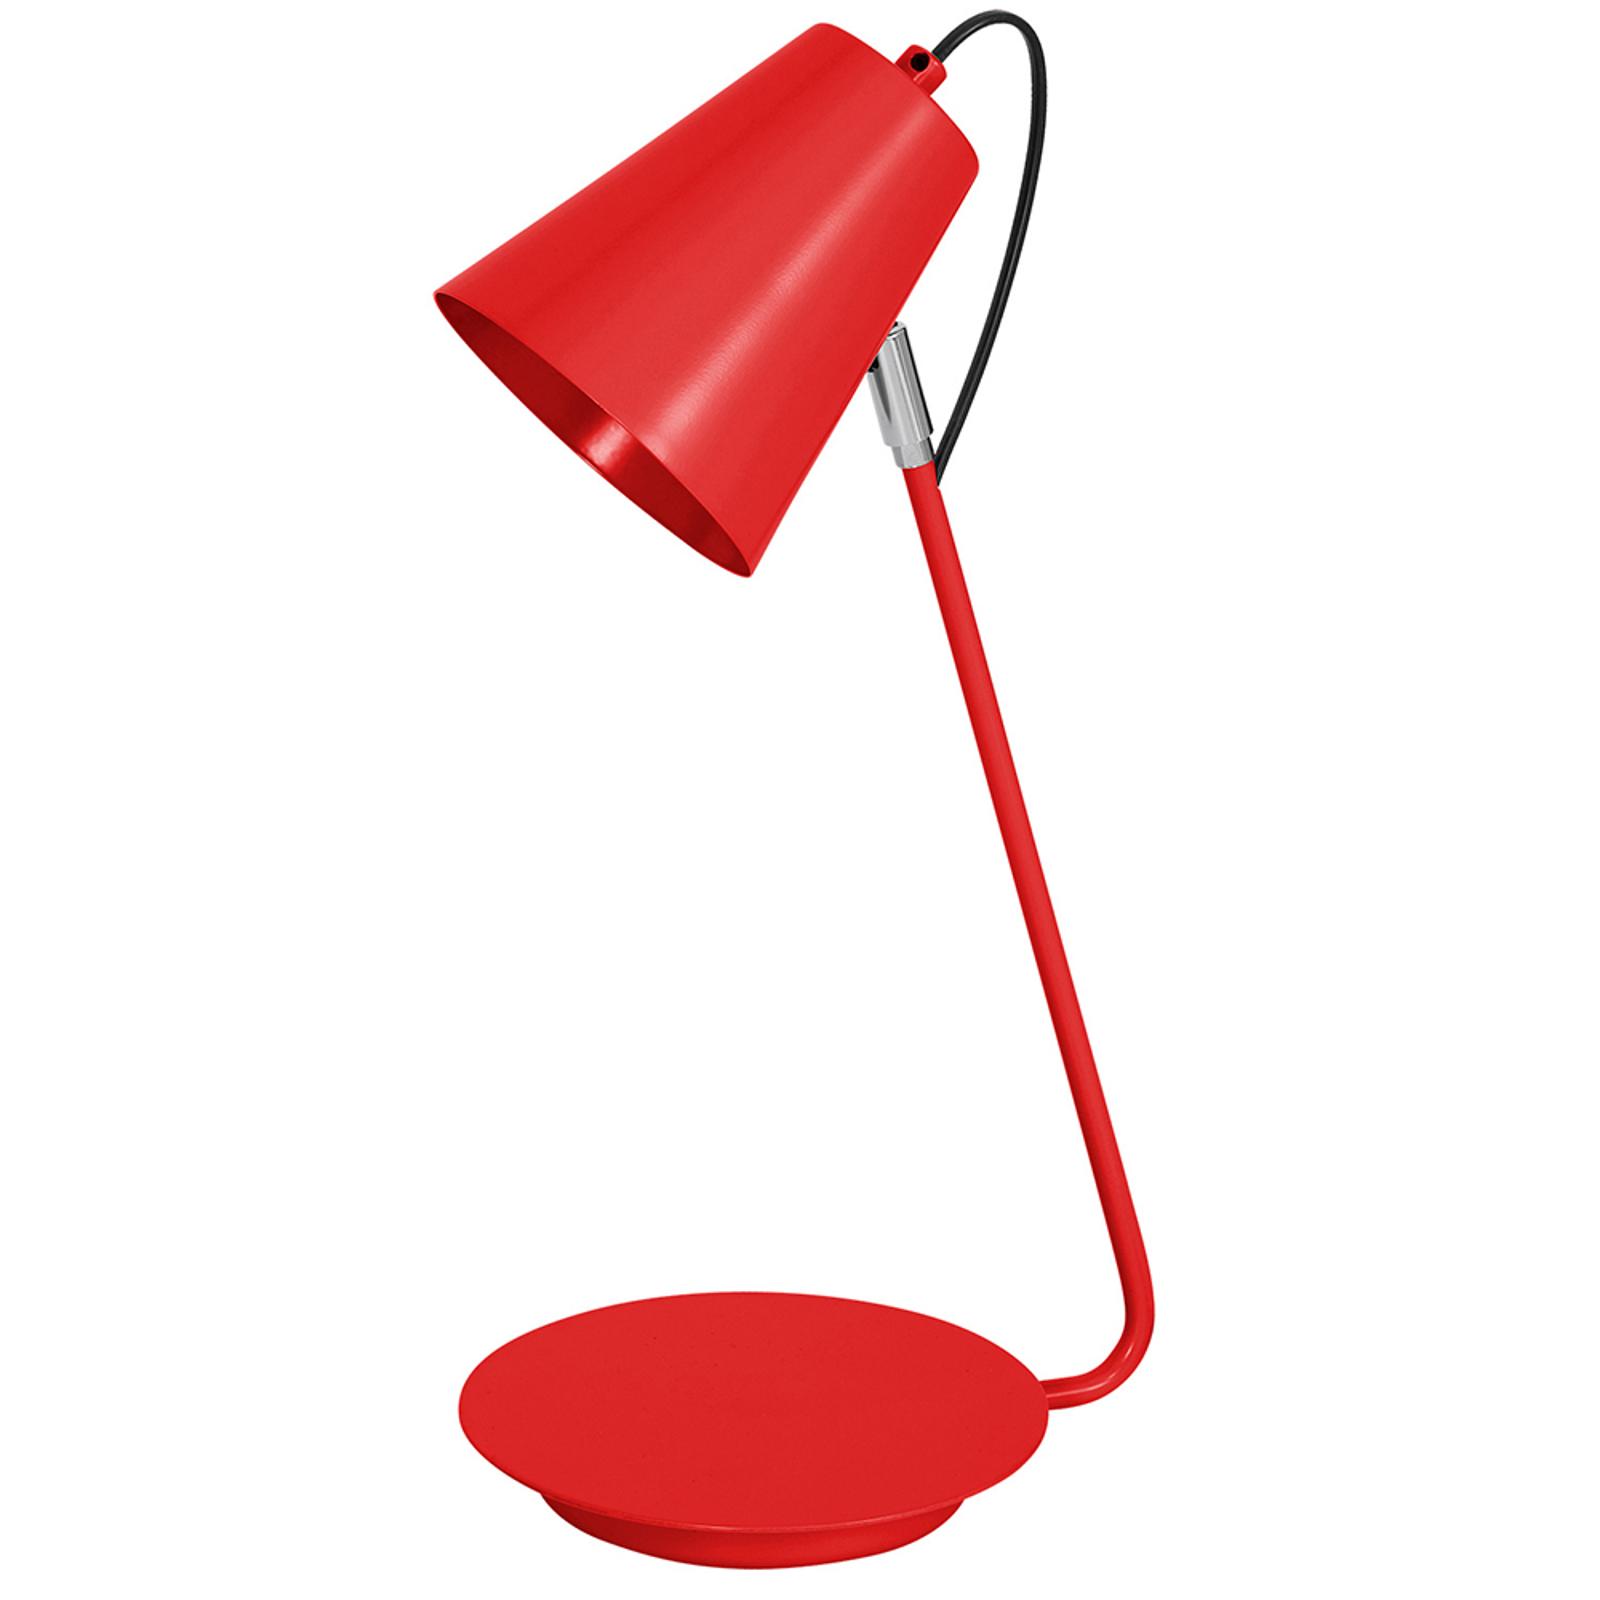 Tischleuchte 8301 kegelförmig Chromdetail, rot